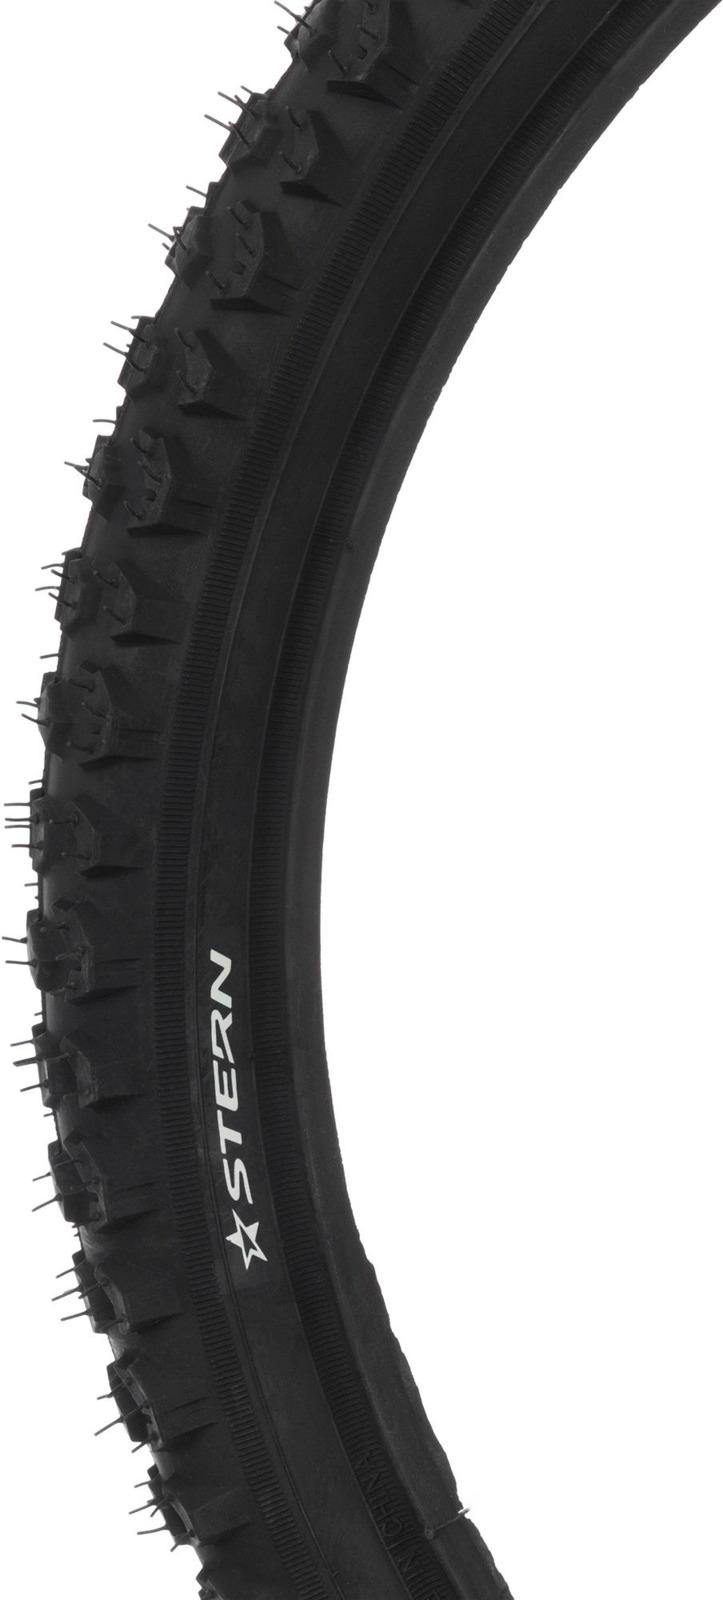 Покрышка Stern CTYRE5\20 Tires, черный, 20 x 1,75 цена и фото